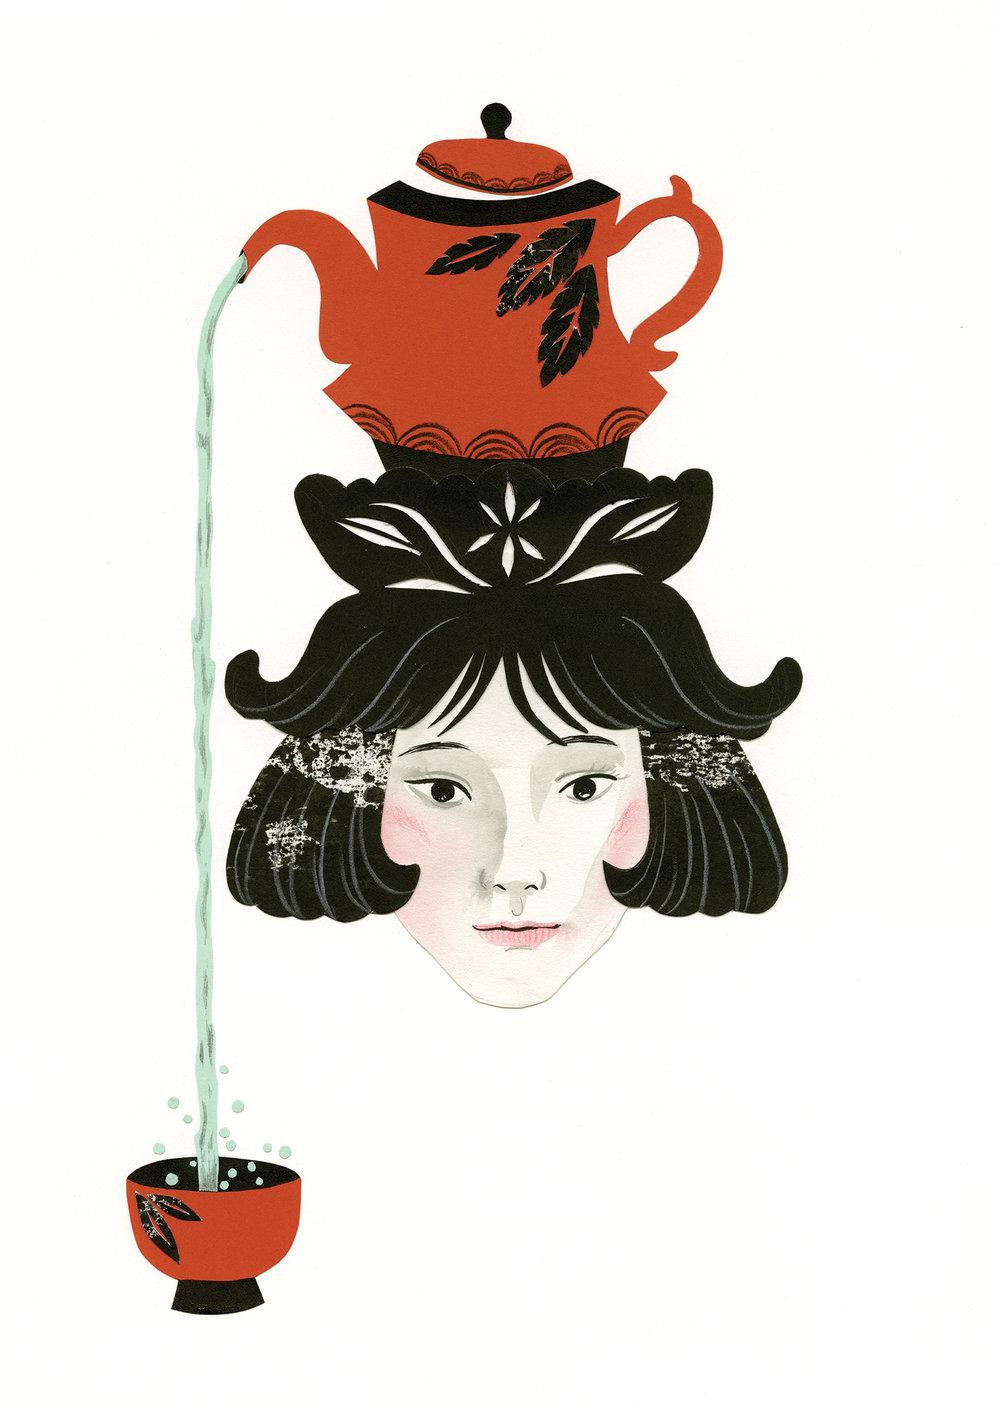 AA 2013 - ARTIST: Hye Jin ChungTITLE: Tea Ceremony Teacher [1 of 3]